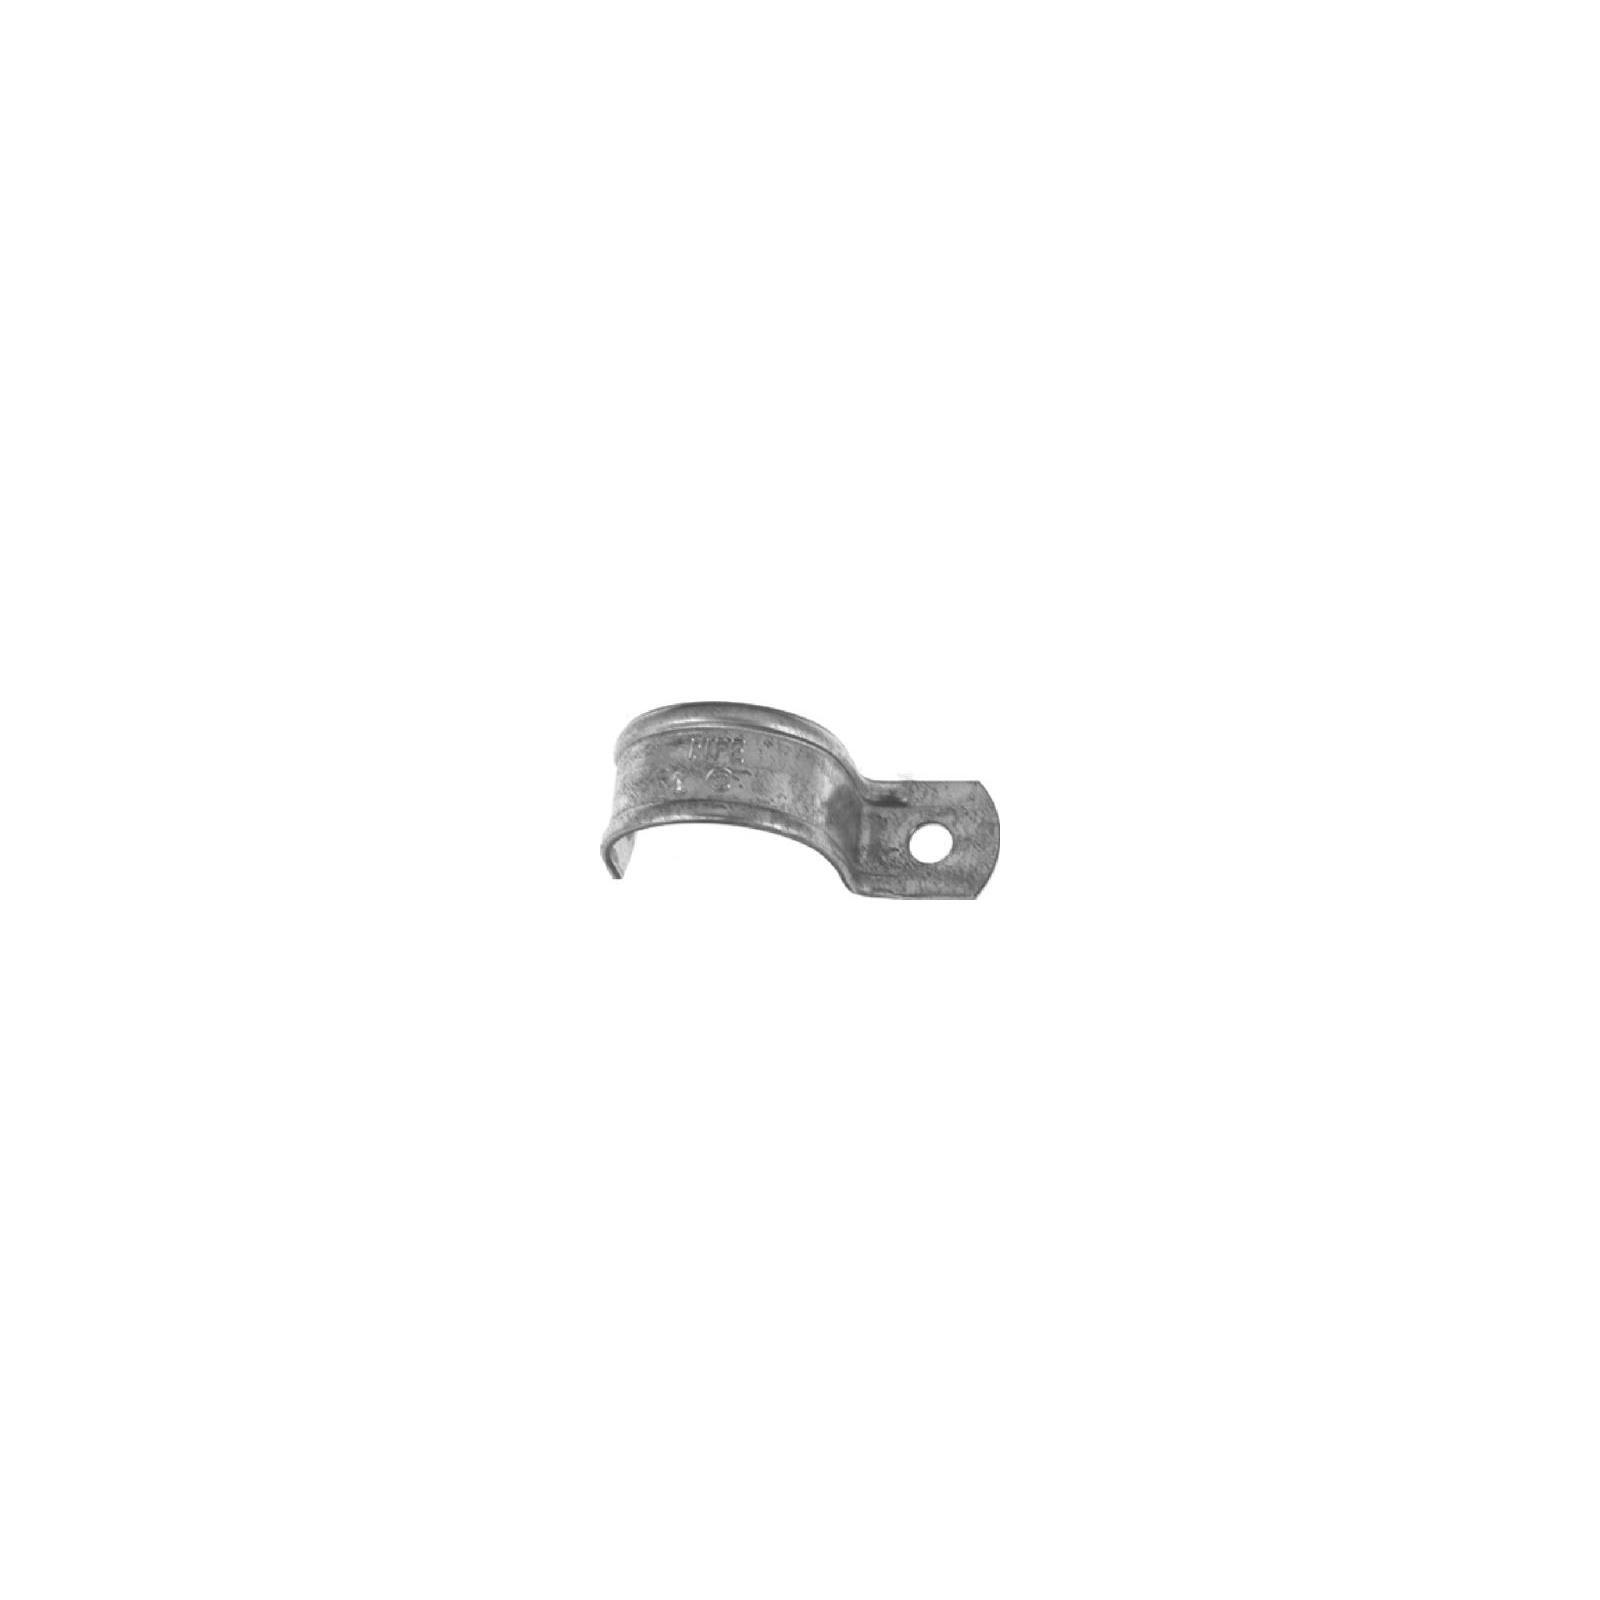 Halex/Scott Fetzer 96115 Rigid/IMC Conduit Steel Strap, One Hole, 1-1/2-In. - Quantity 10